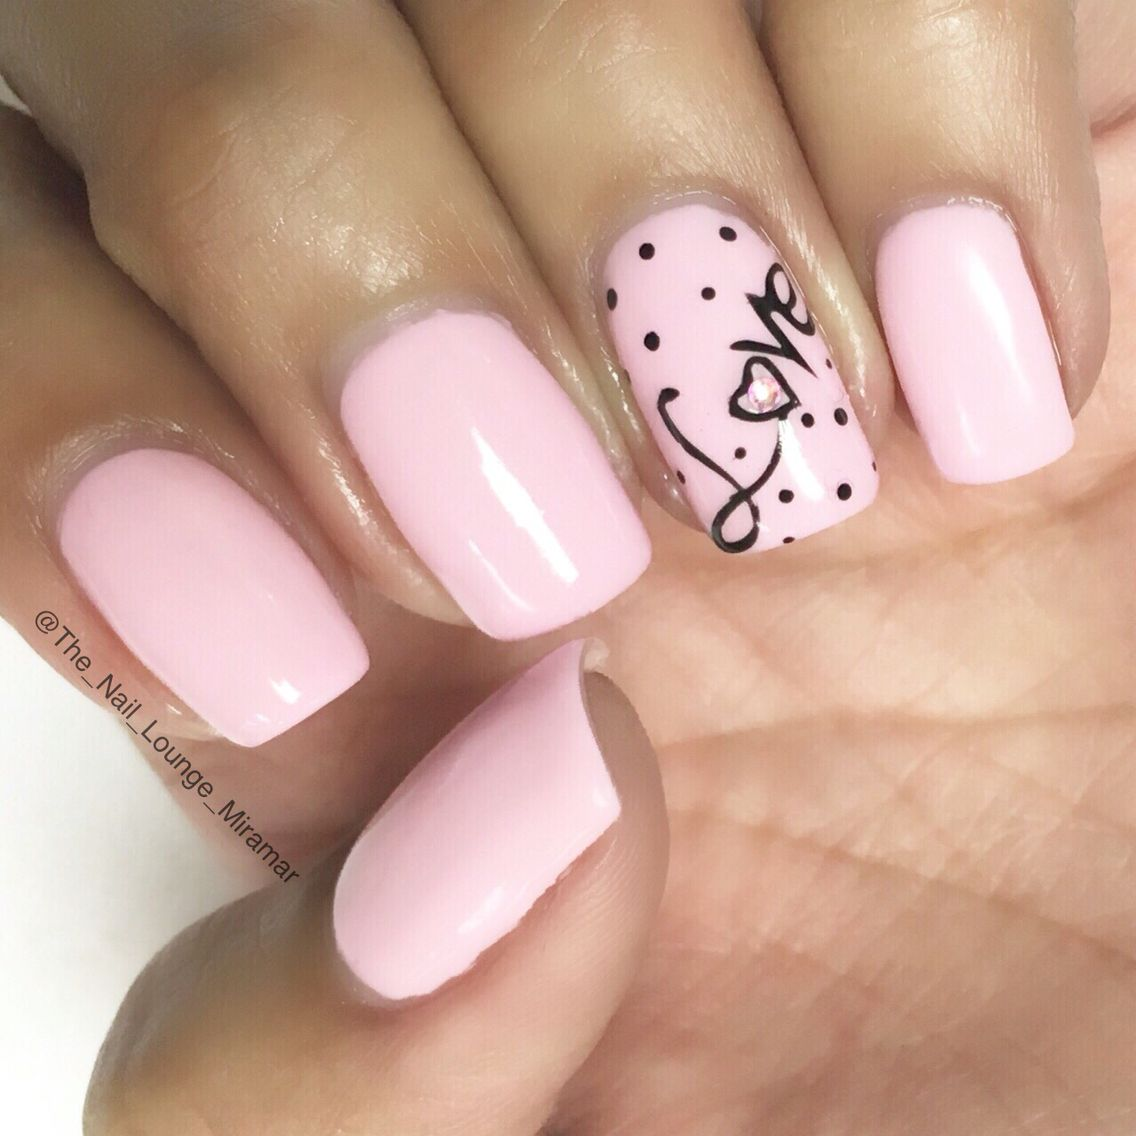 Valentines love nail art design | Nail Art | Pinterest | Acrylic gel ...